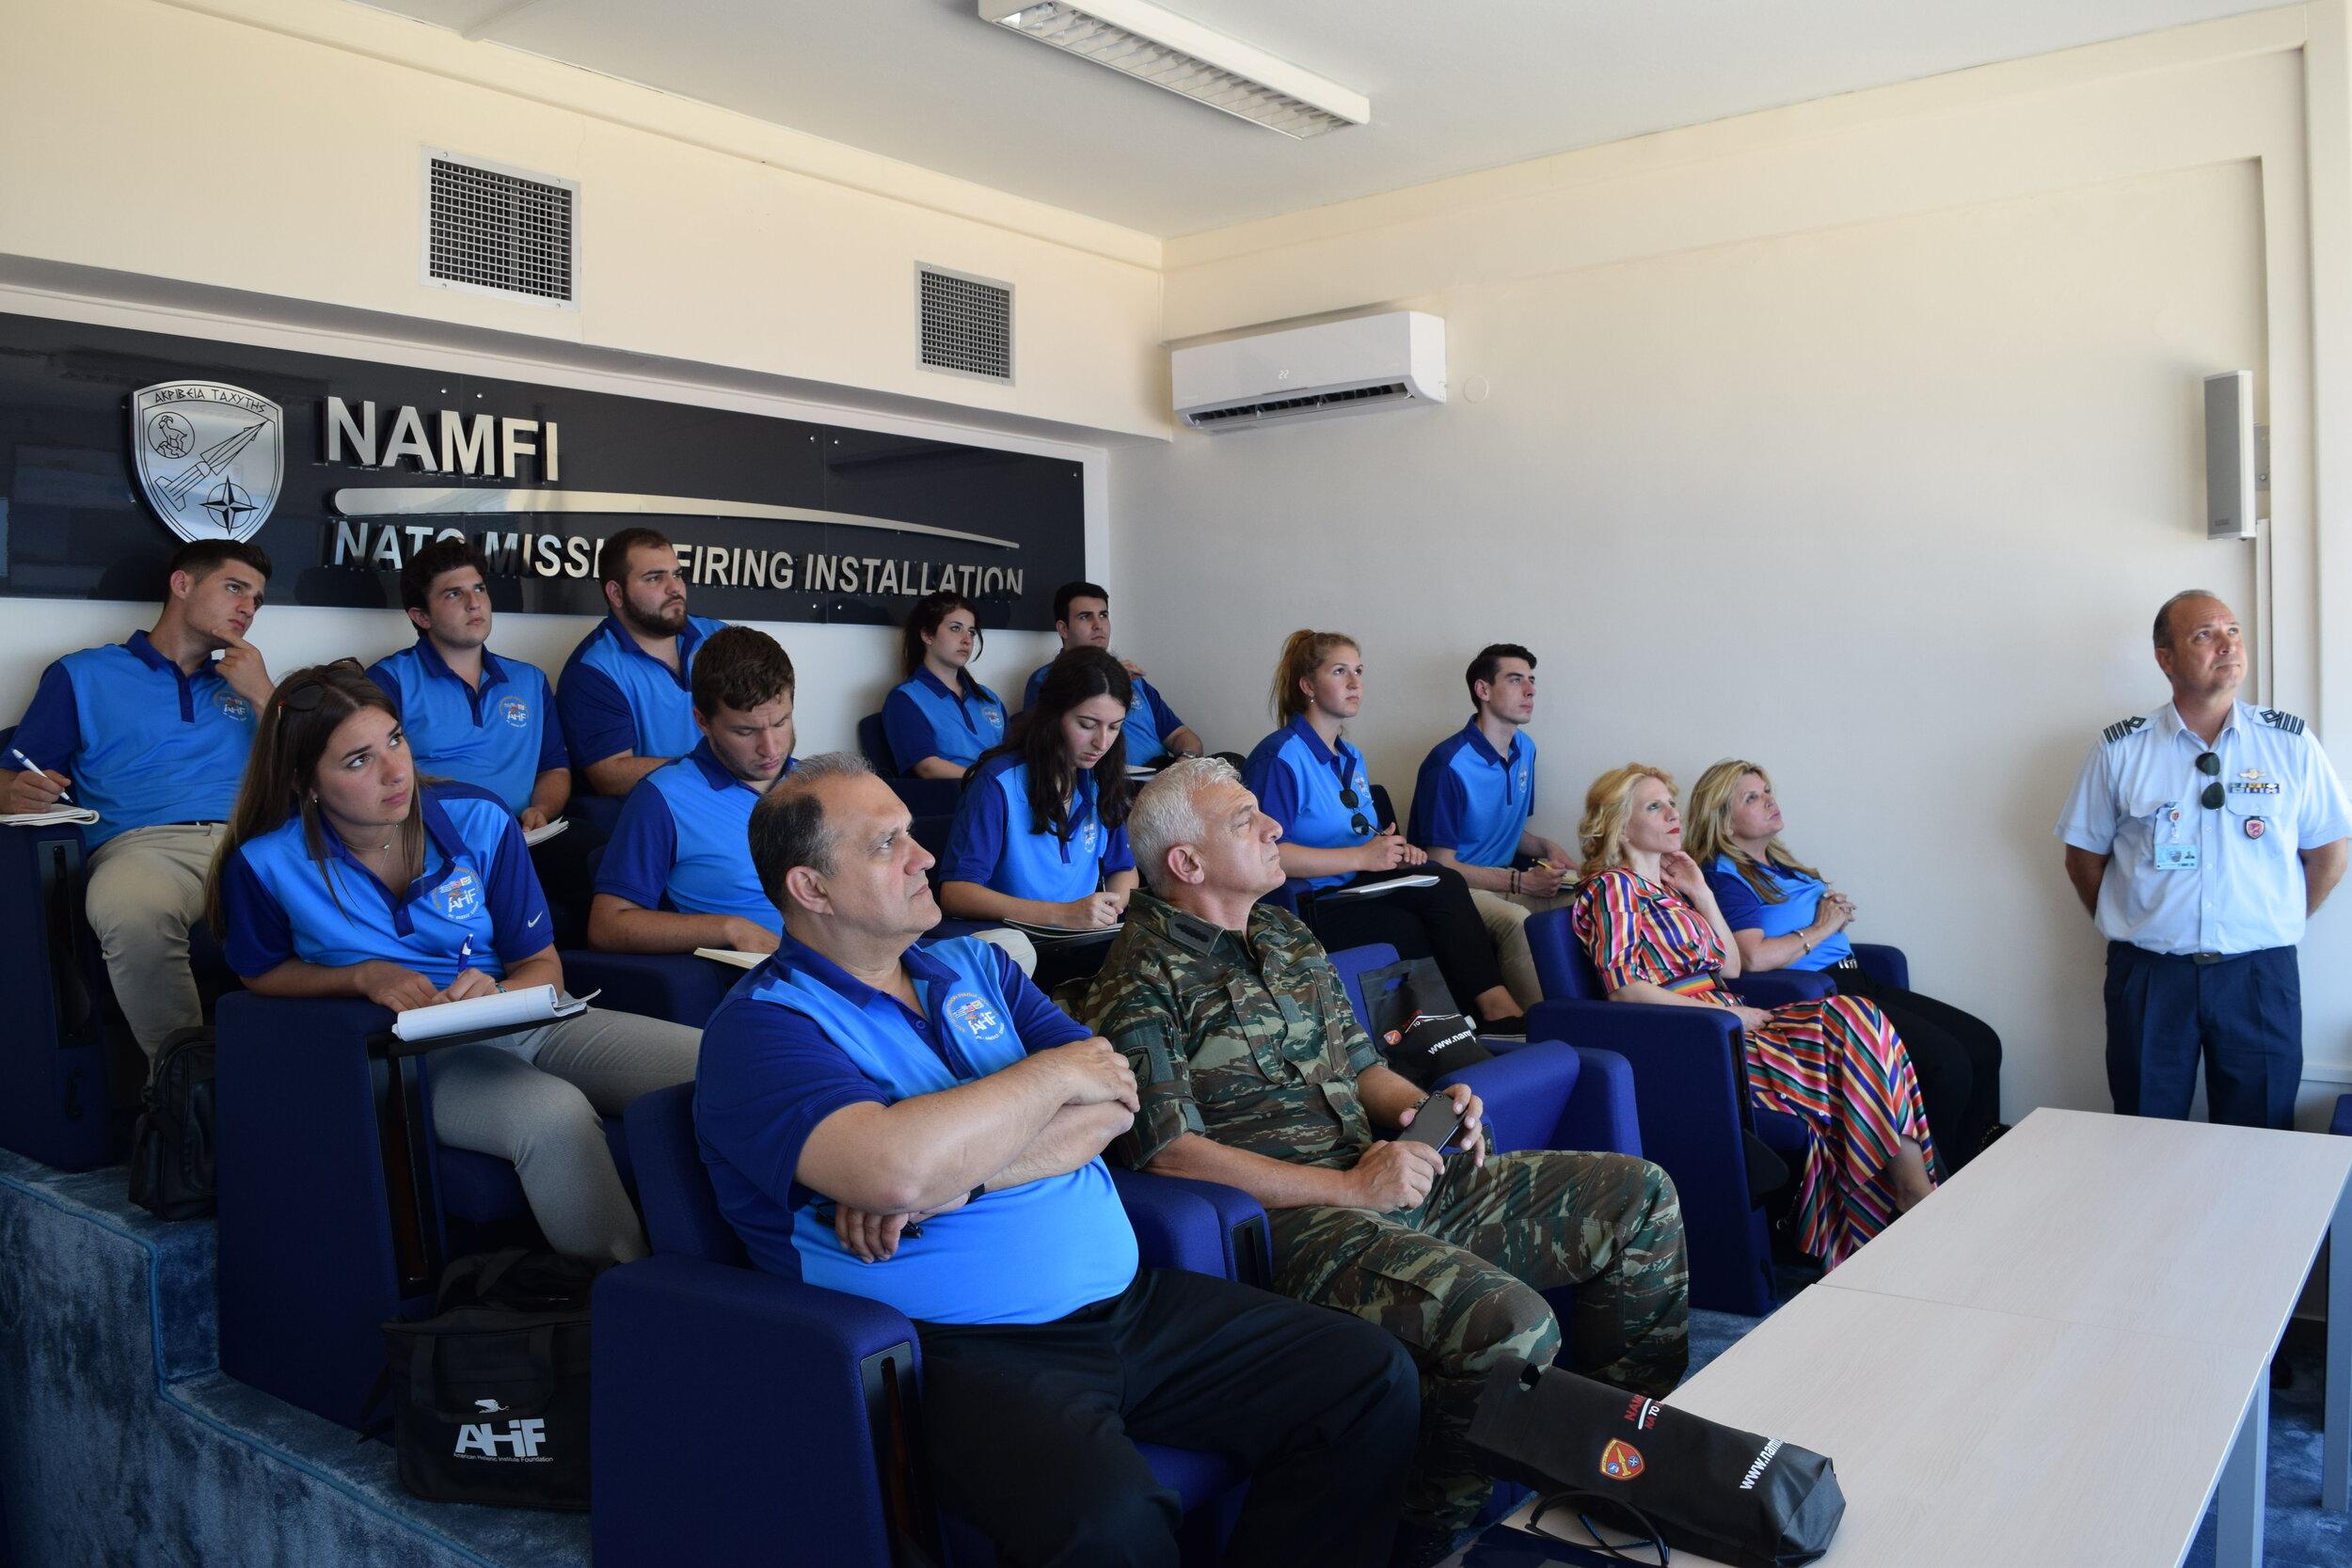 Briefing at NATO Missile Firing Installation (NAMFI)